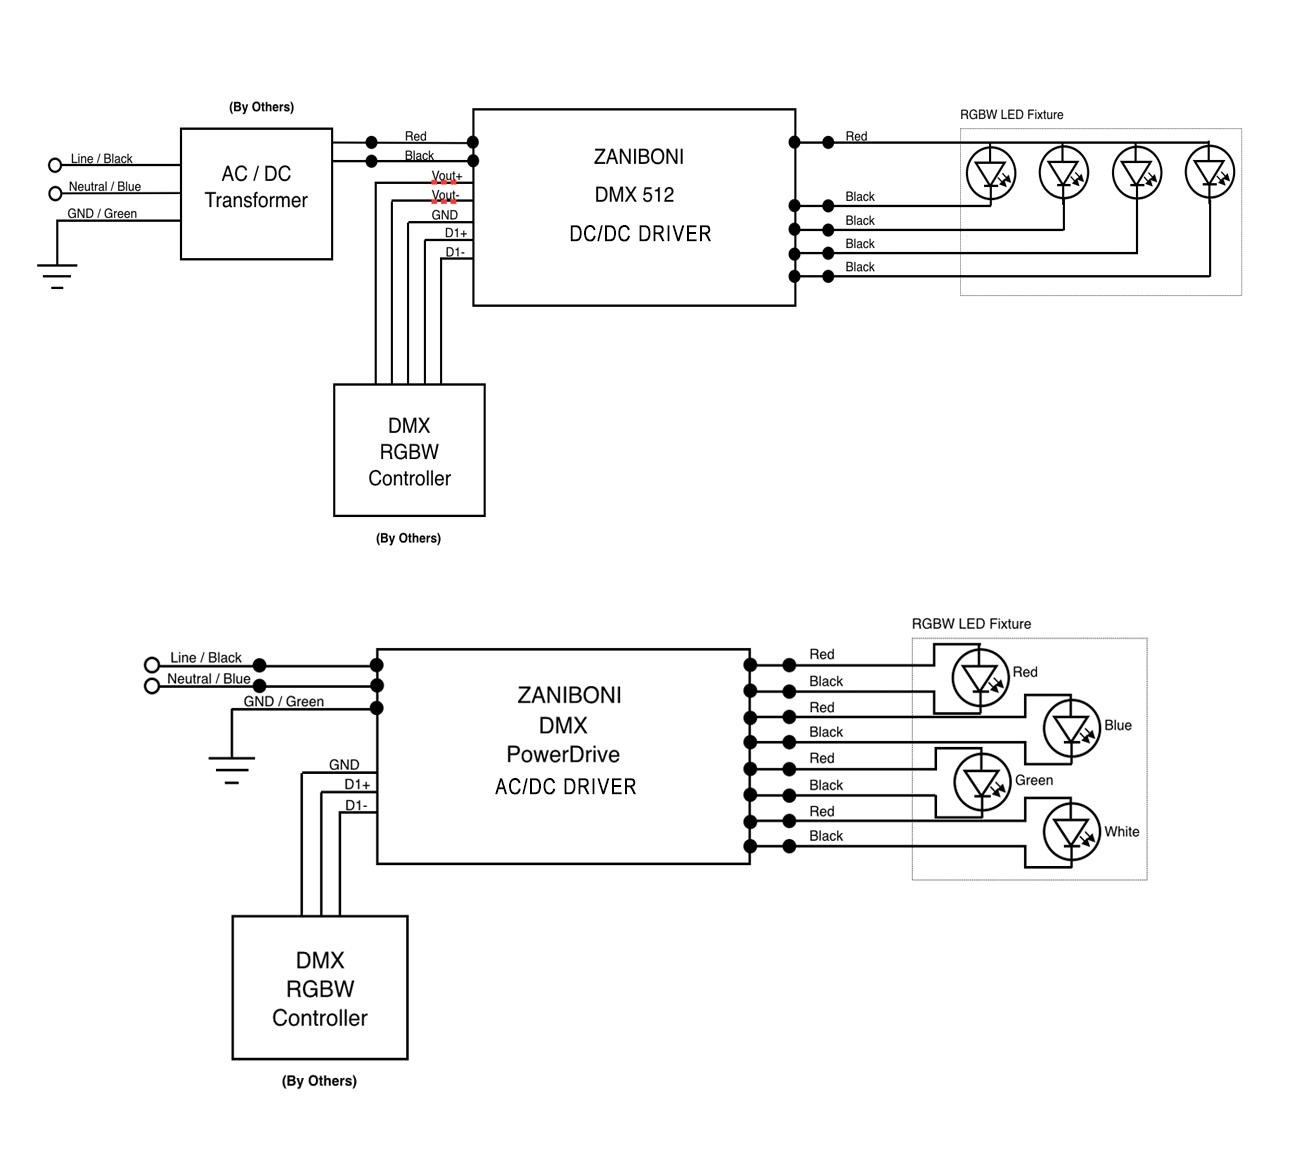 Wiring Diagrams Part 1